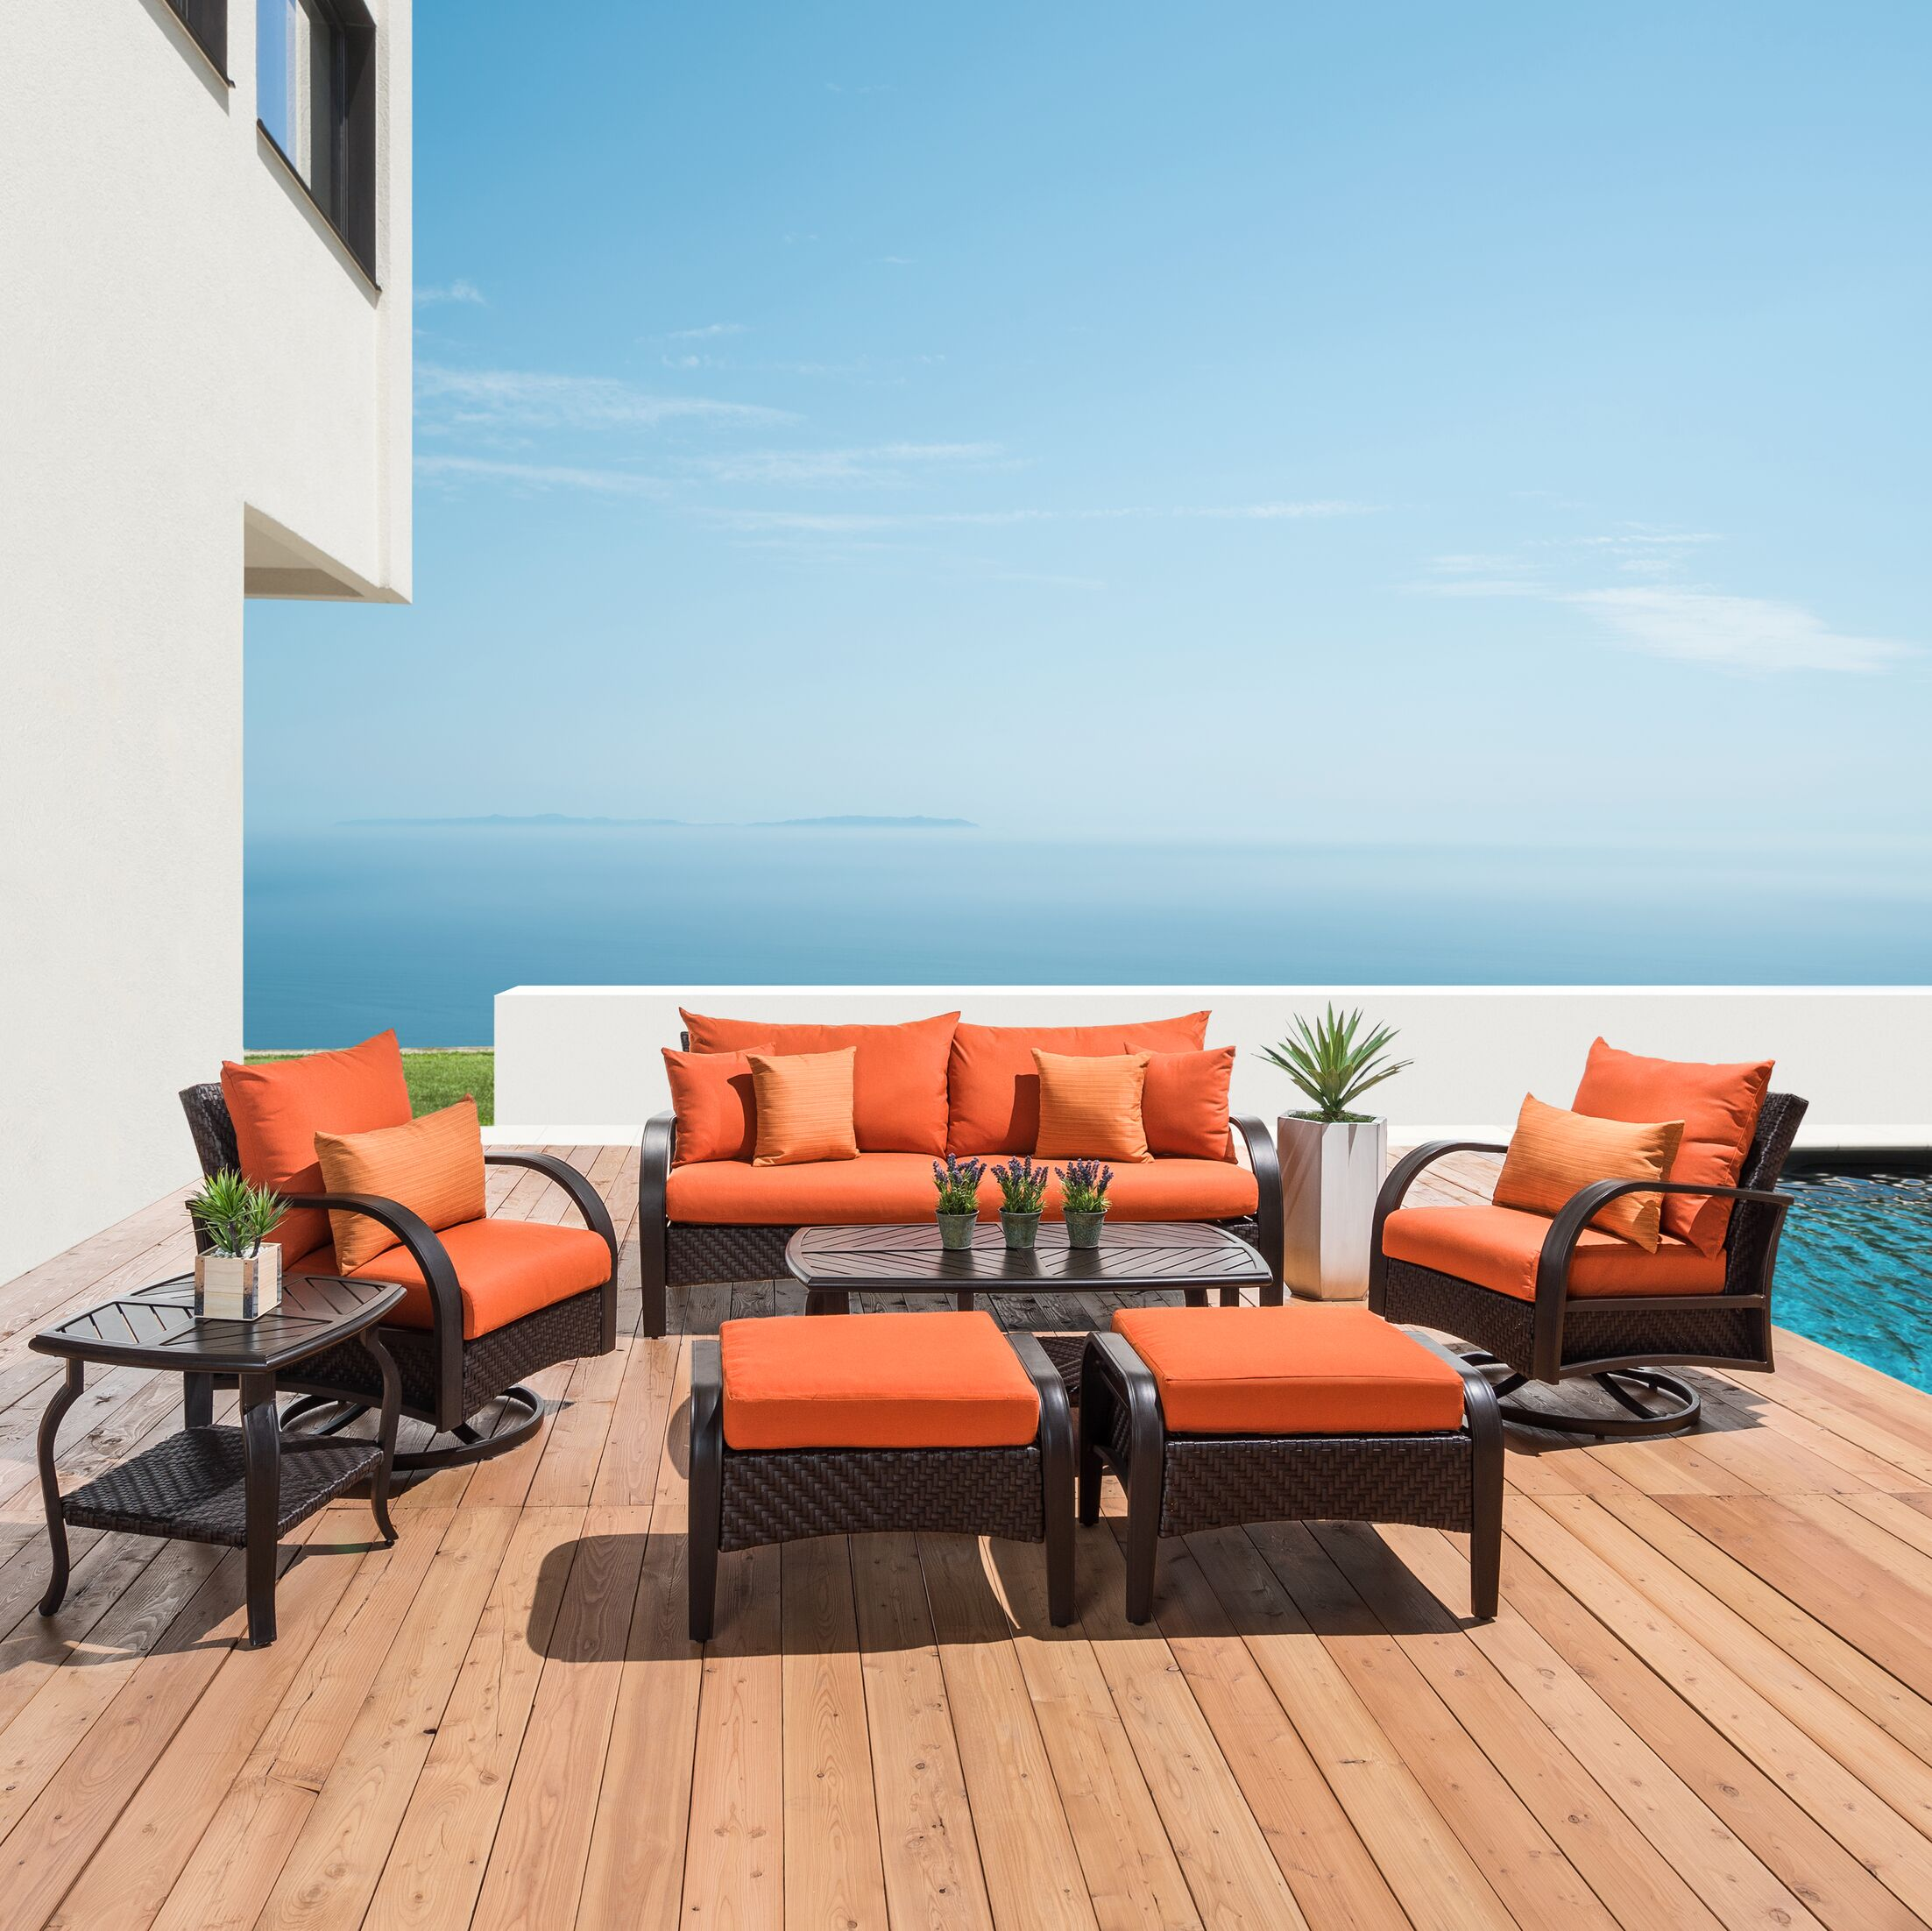 Cumberland 7 Piece Sunbrella Sofa Set with Cushions Cushion Color: Tikka Orange